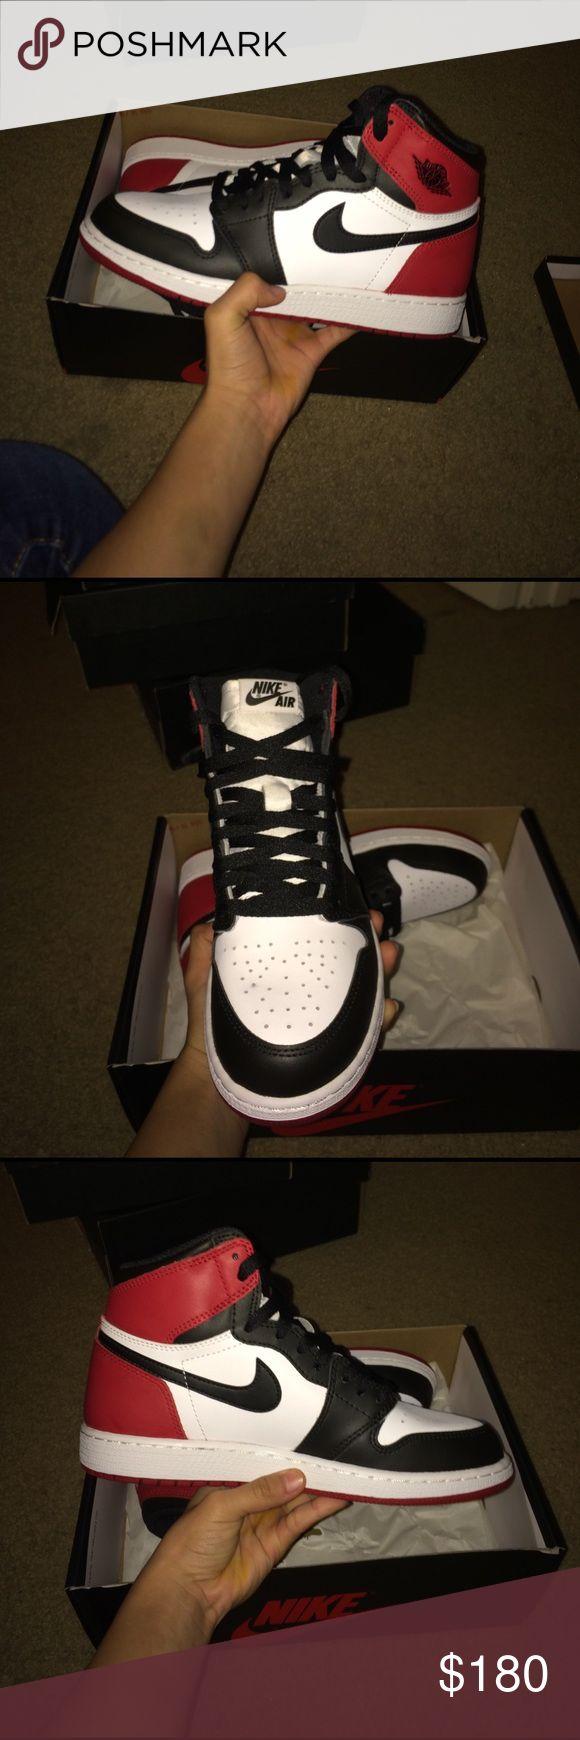 Jordan 1 black toe 10/10 condition size 6 Jordan Shoes